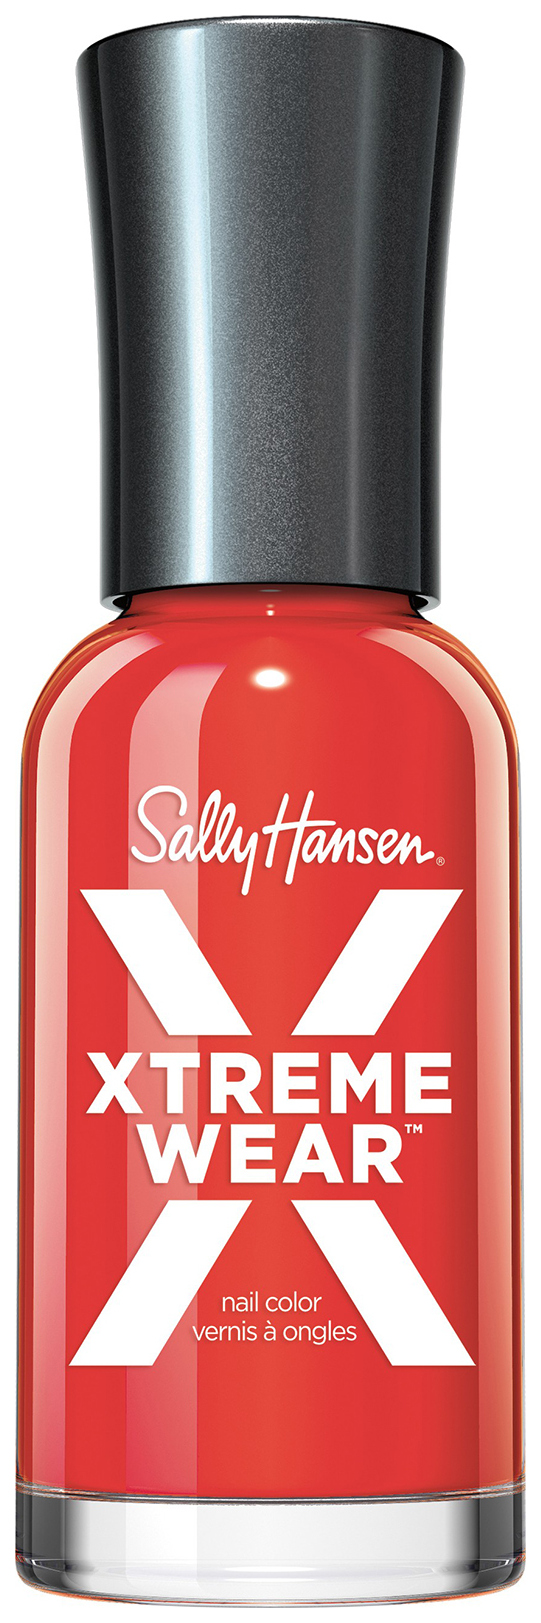 Лак для ногтей Sally Hansen Xtreme Wear Nail Color 303 Selfie Red-y 11,8 мл